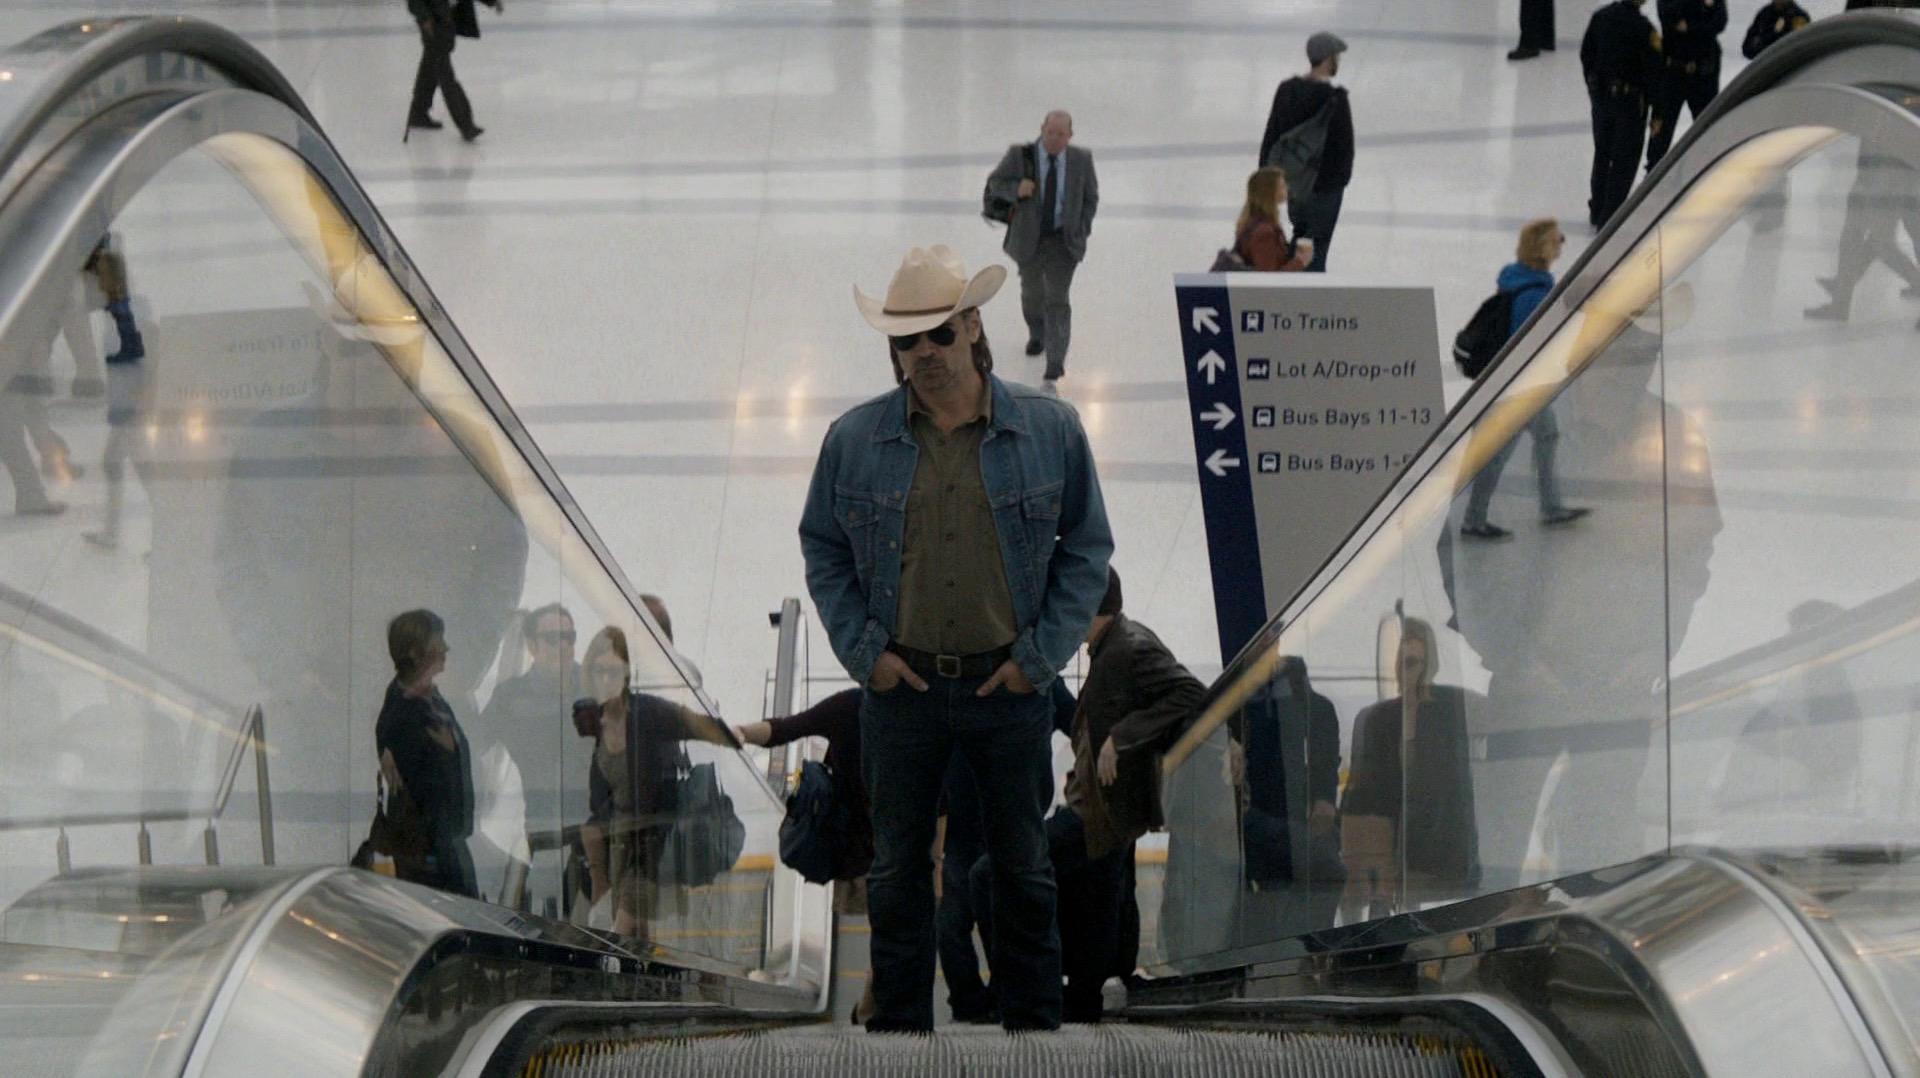 Ray ascends the escalator